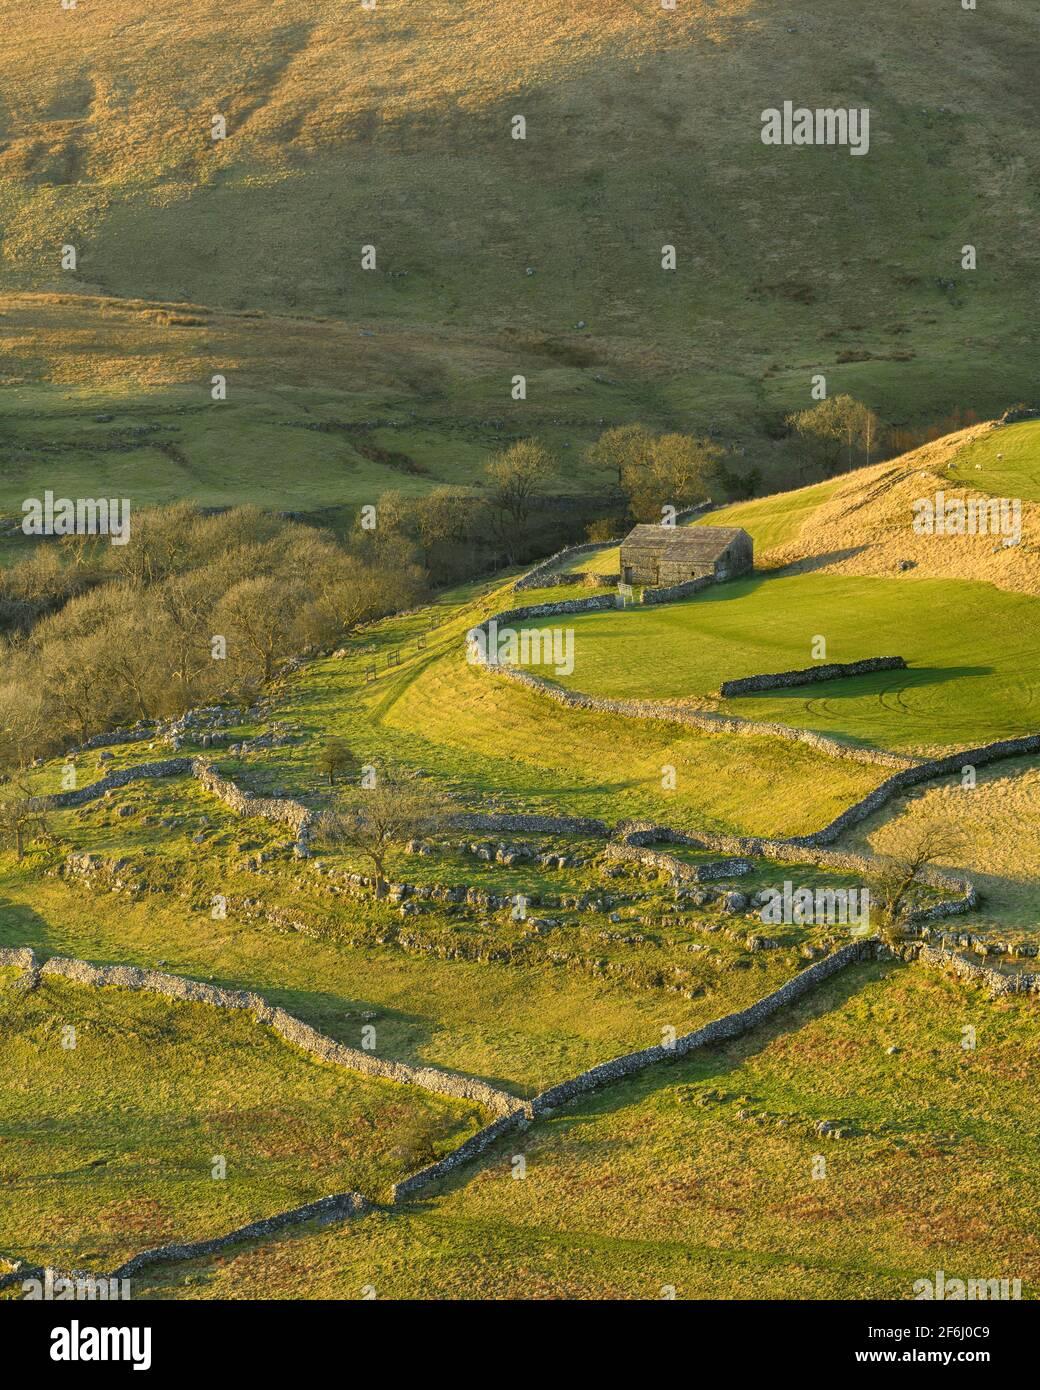 Scenic sunny Wharfedale landscape (upland fells, stone barn, steep hillside slopes, limestone walls, grazing pastures) - Yorkshire Dales, England UK. Stock Photo